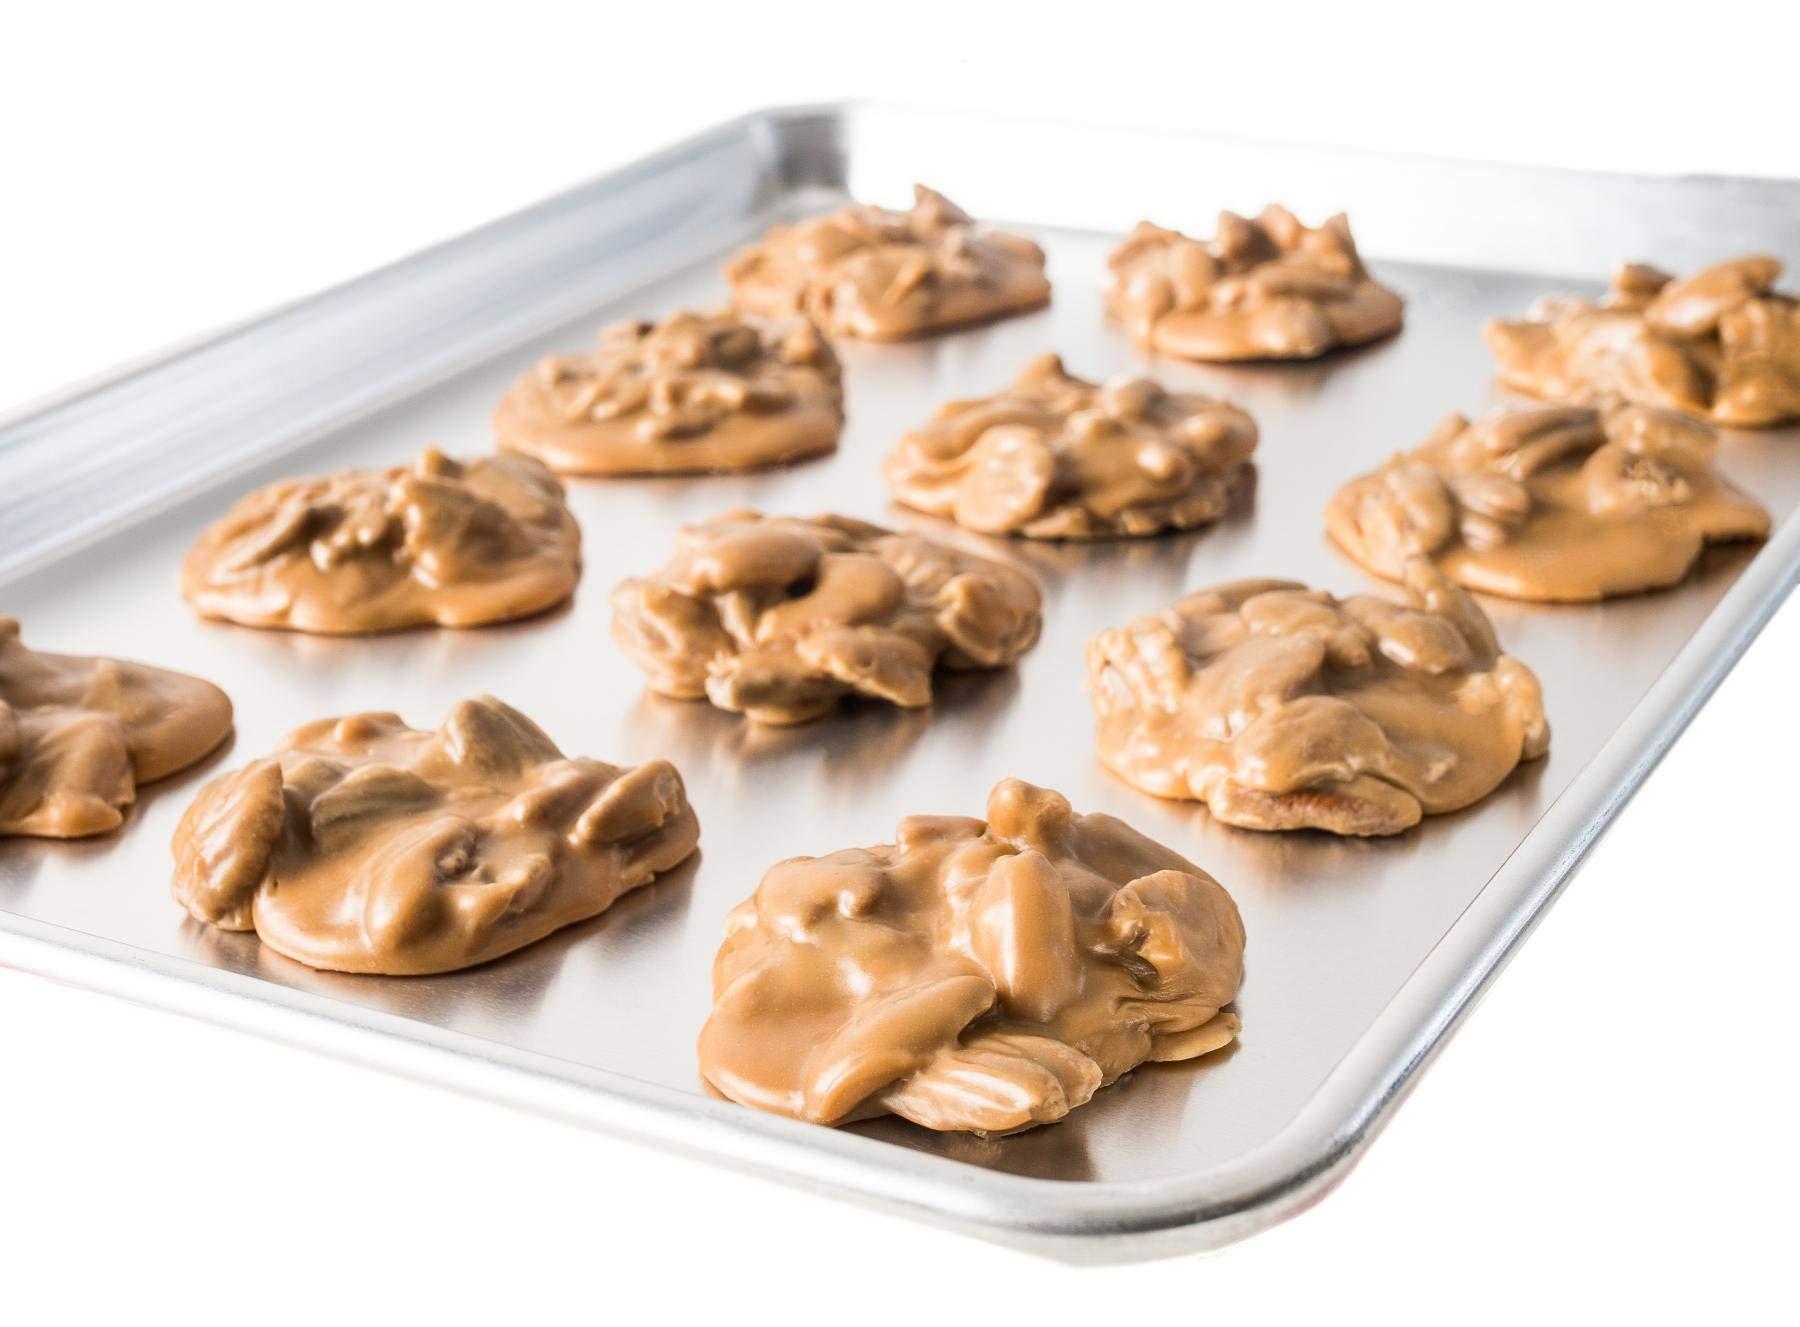 Heat & Serve Original Pecan Pralines   Savannah's Candy Kitchen - Includes Praline Baking Mat by Savannah's Candy Kitchen